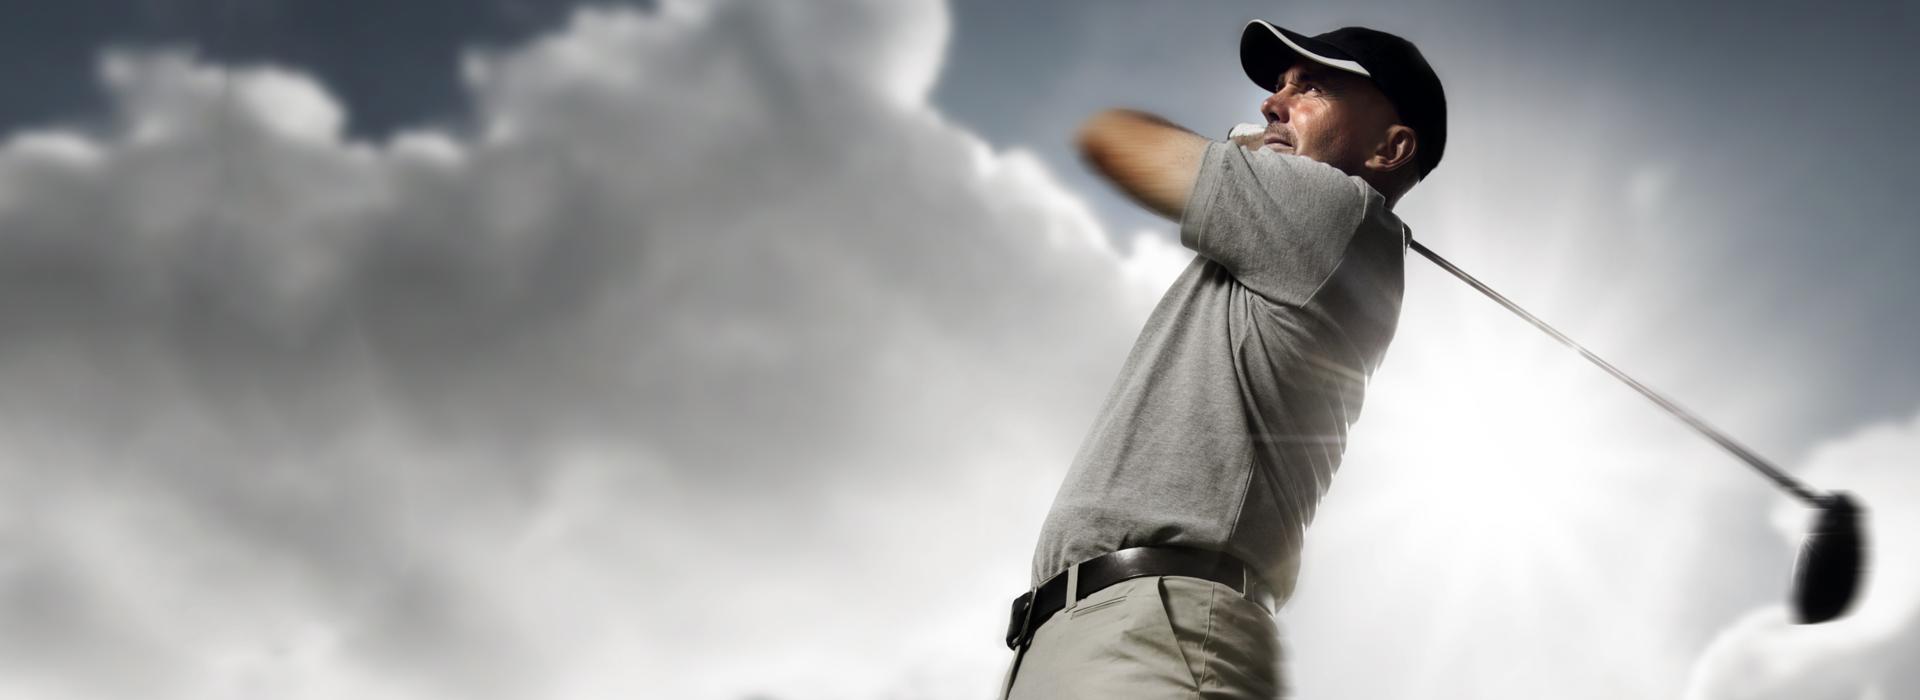 golf-act